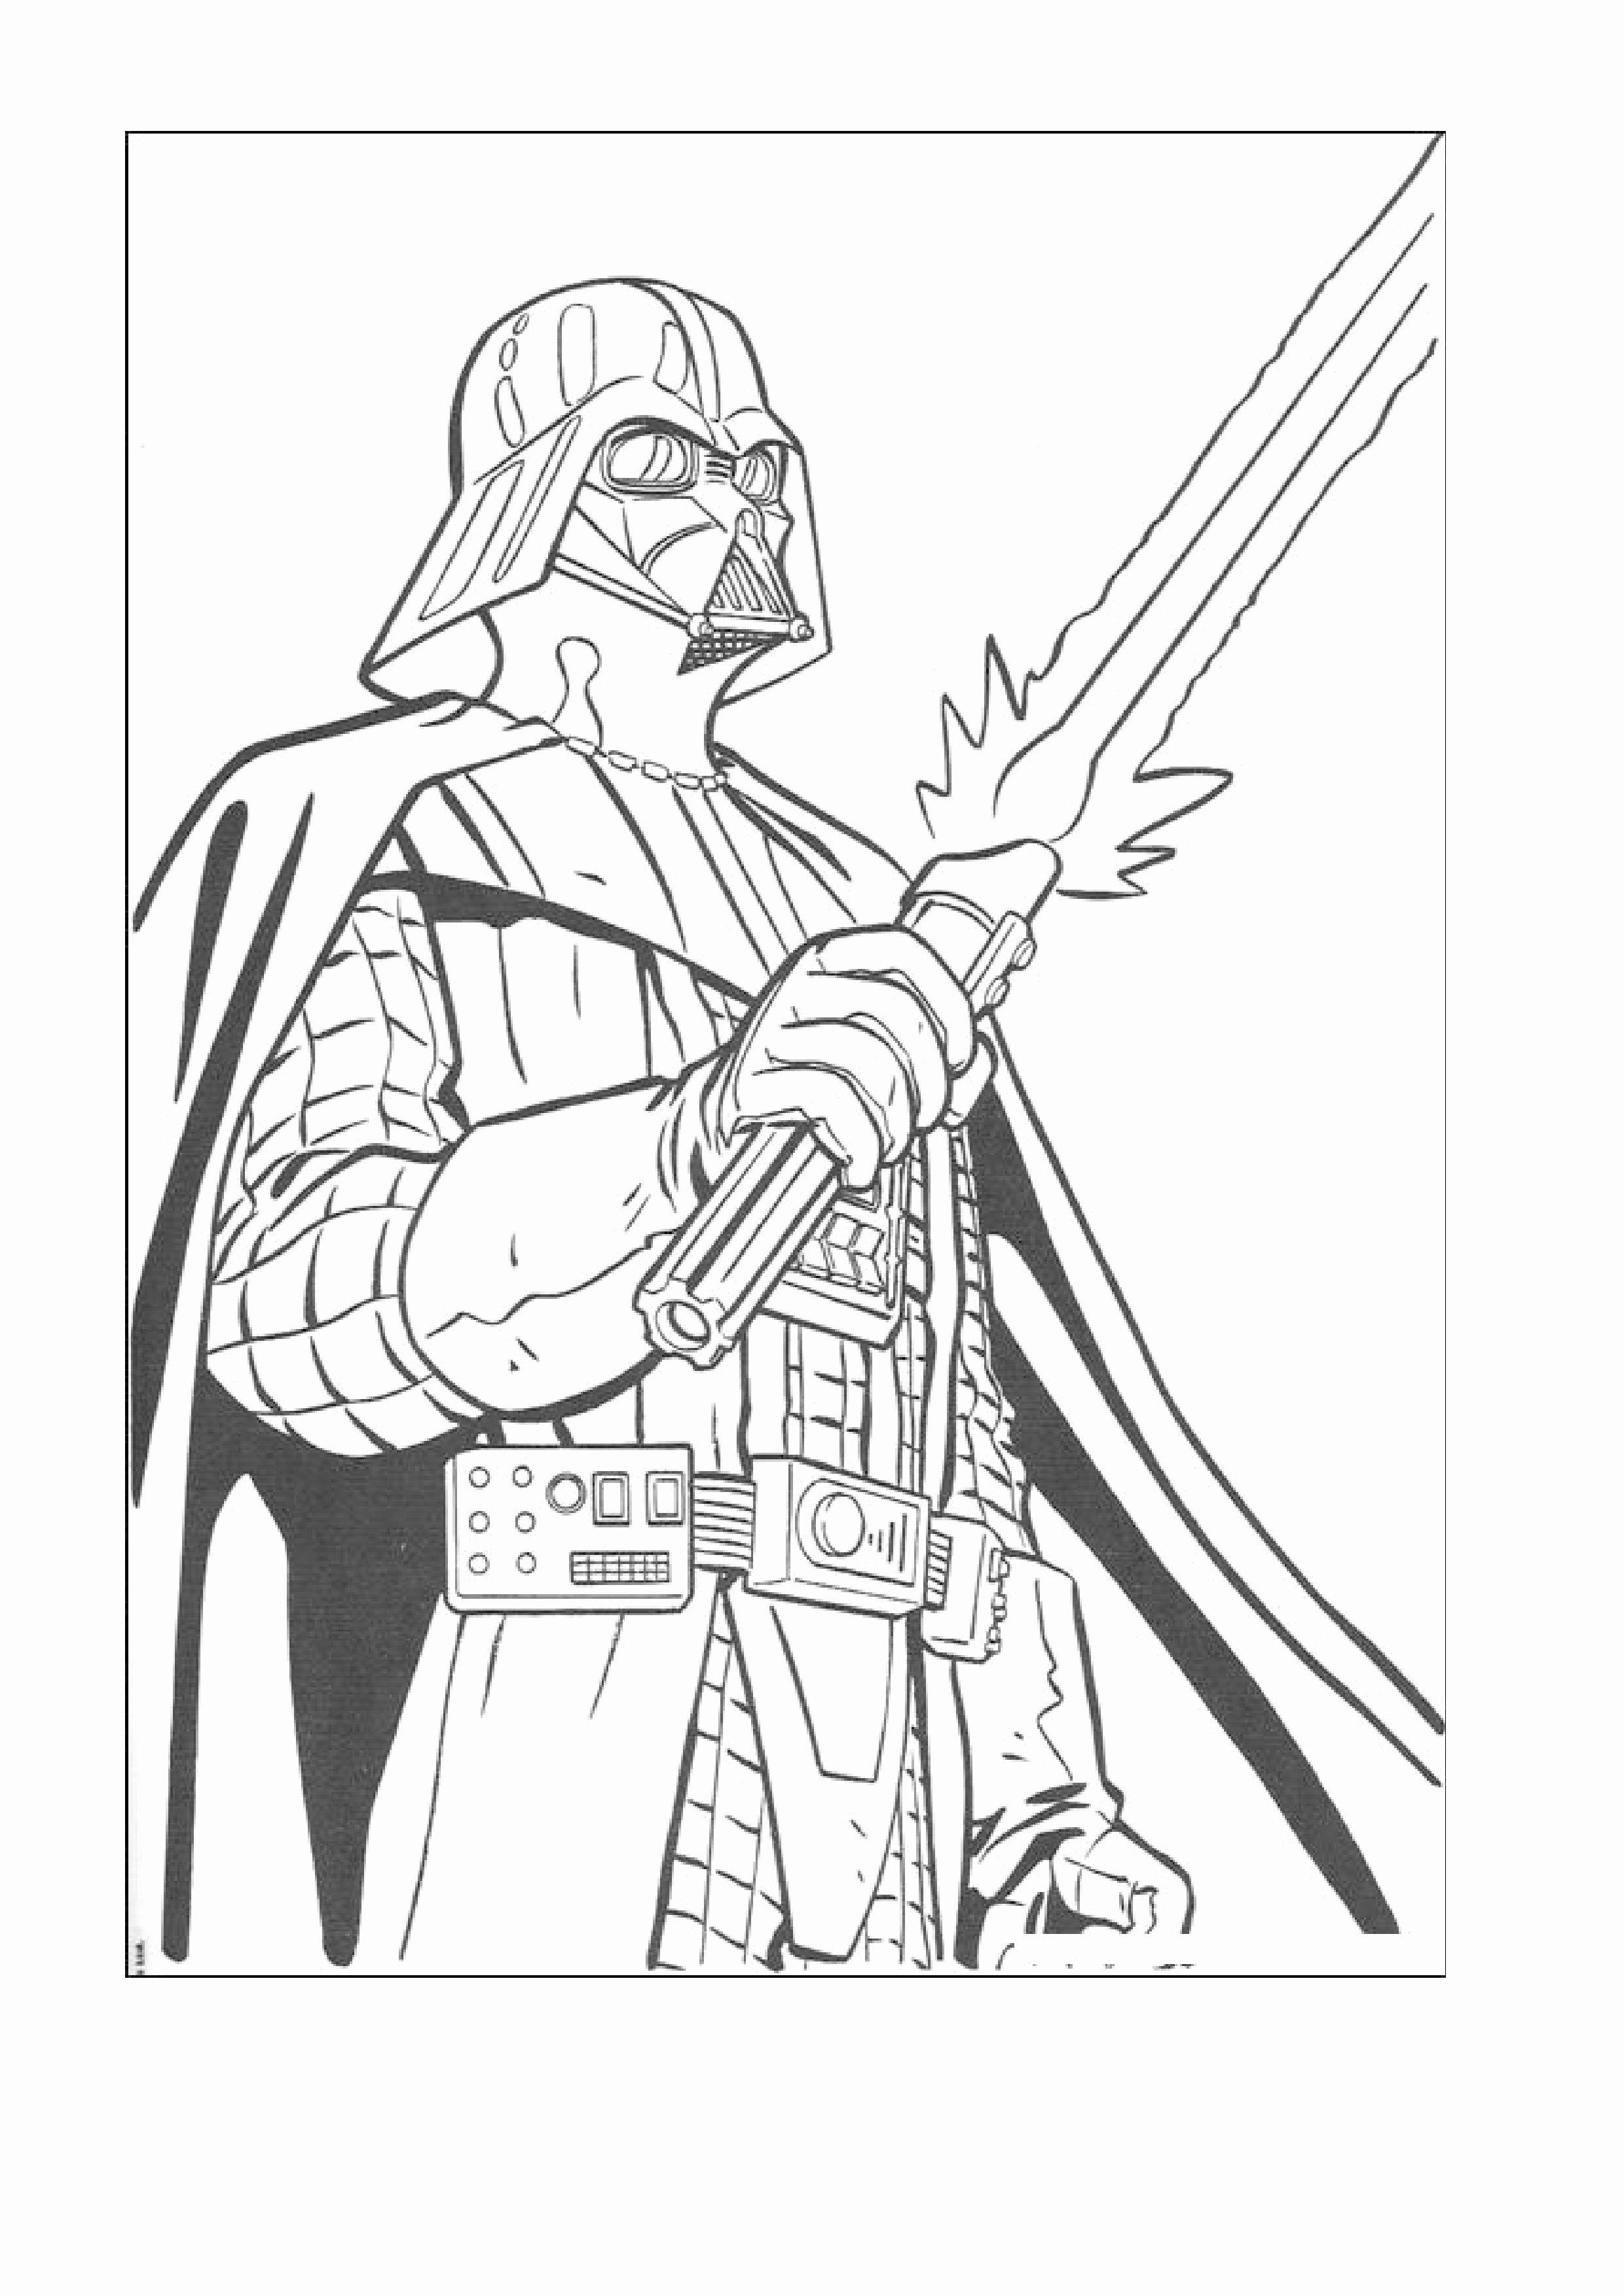 Darth Vader Coloring Page Elegant Darth Maul Free Coloring Pages Star Wars Drawings Star Wars Coloring Sheet Star Wars Coloring Book